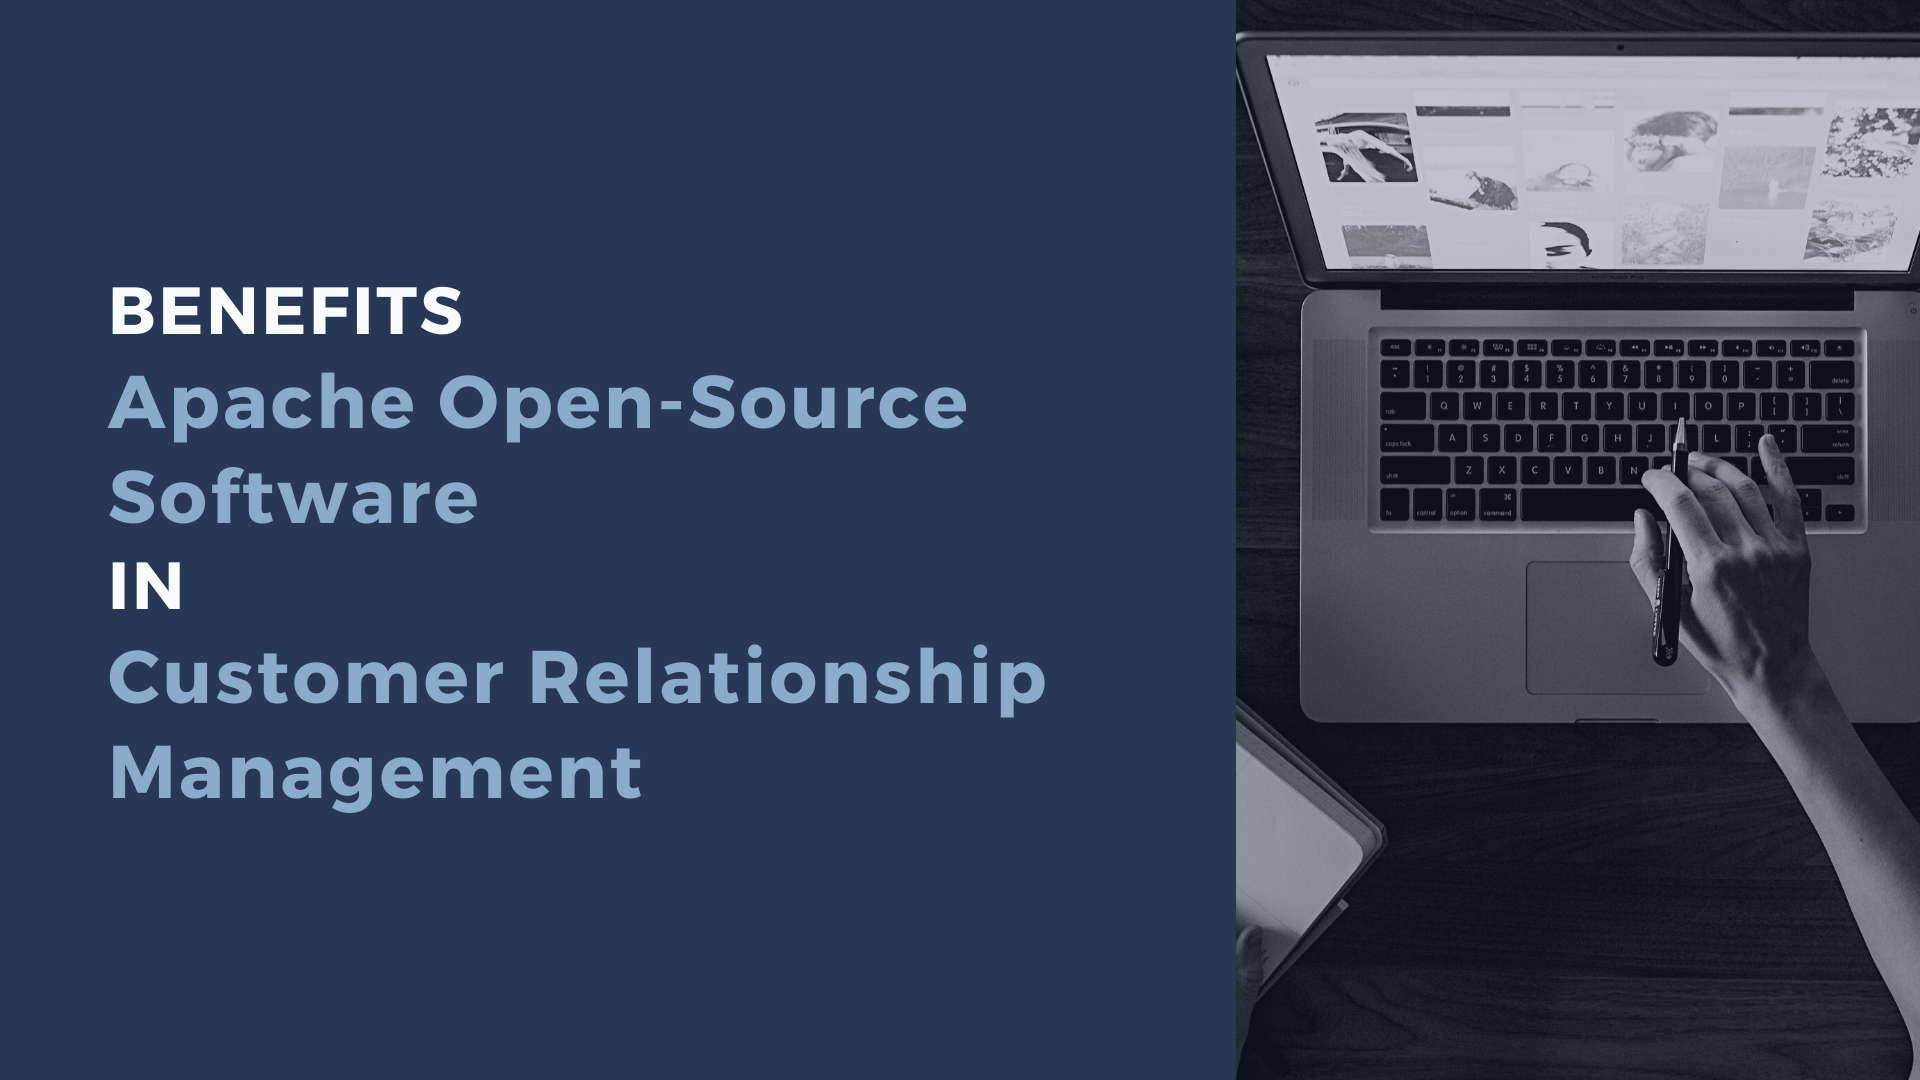 Apache open-source CRM